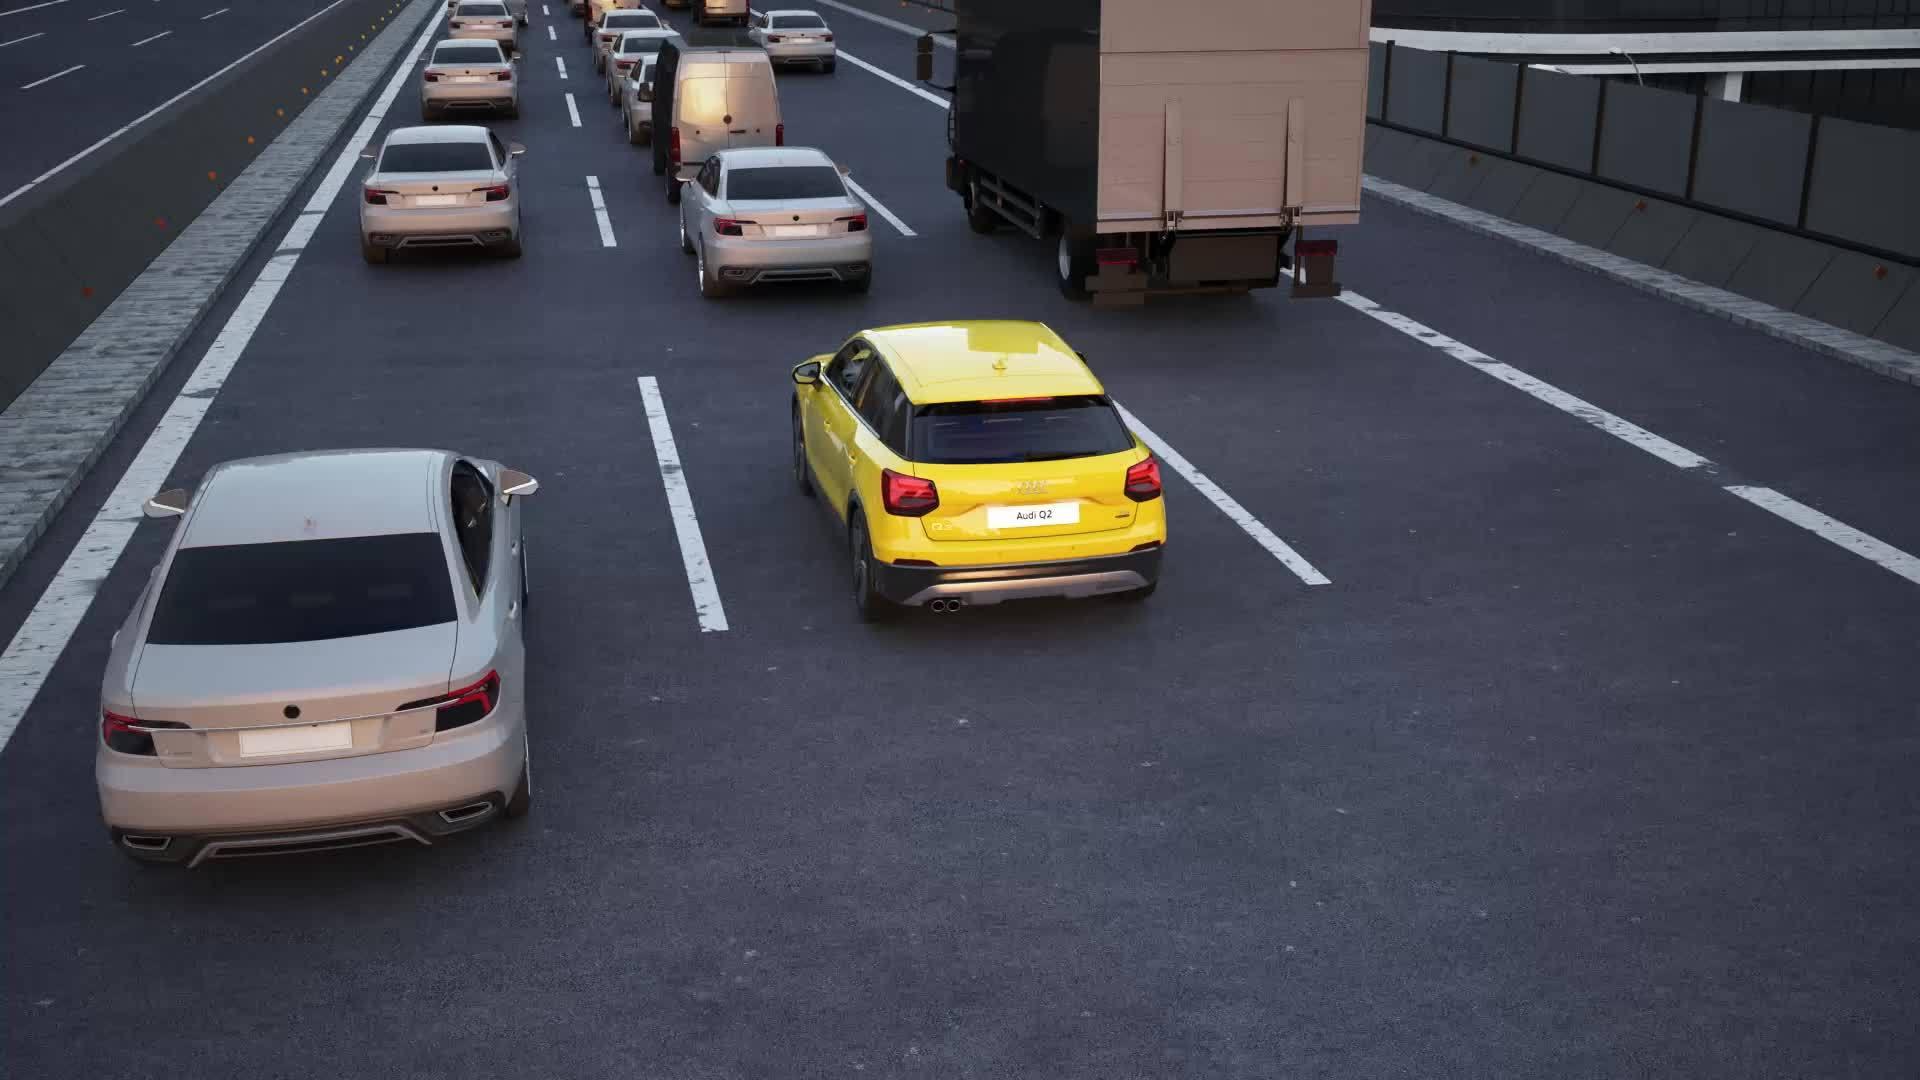 Audi Q2 - Animation traffic jam assist